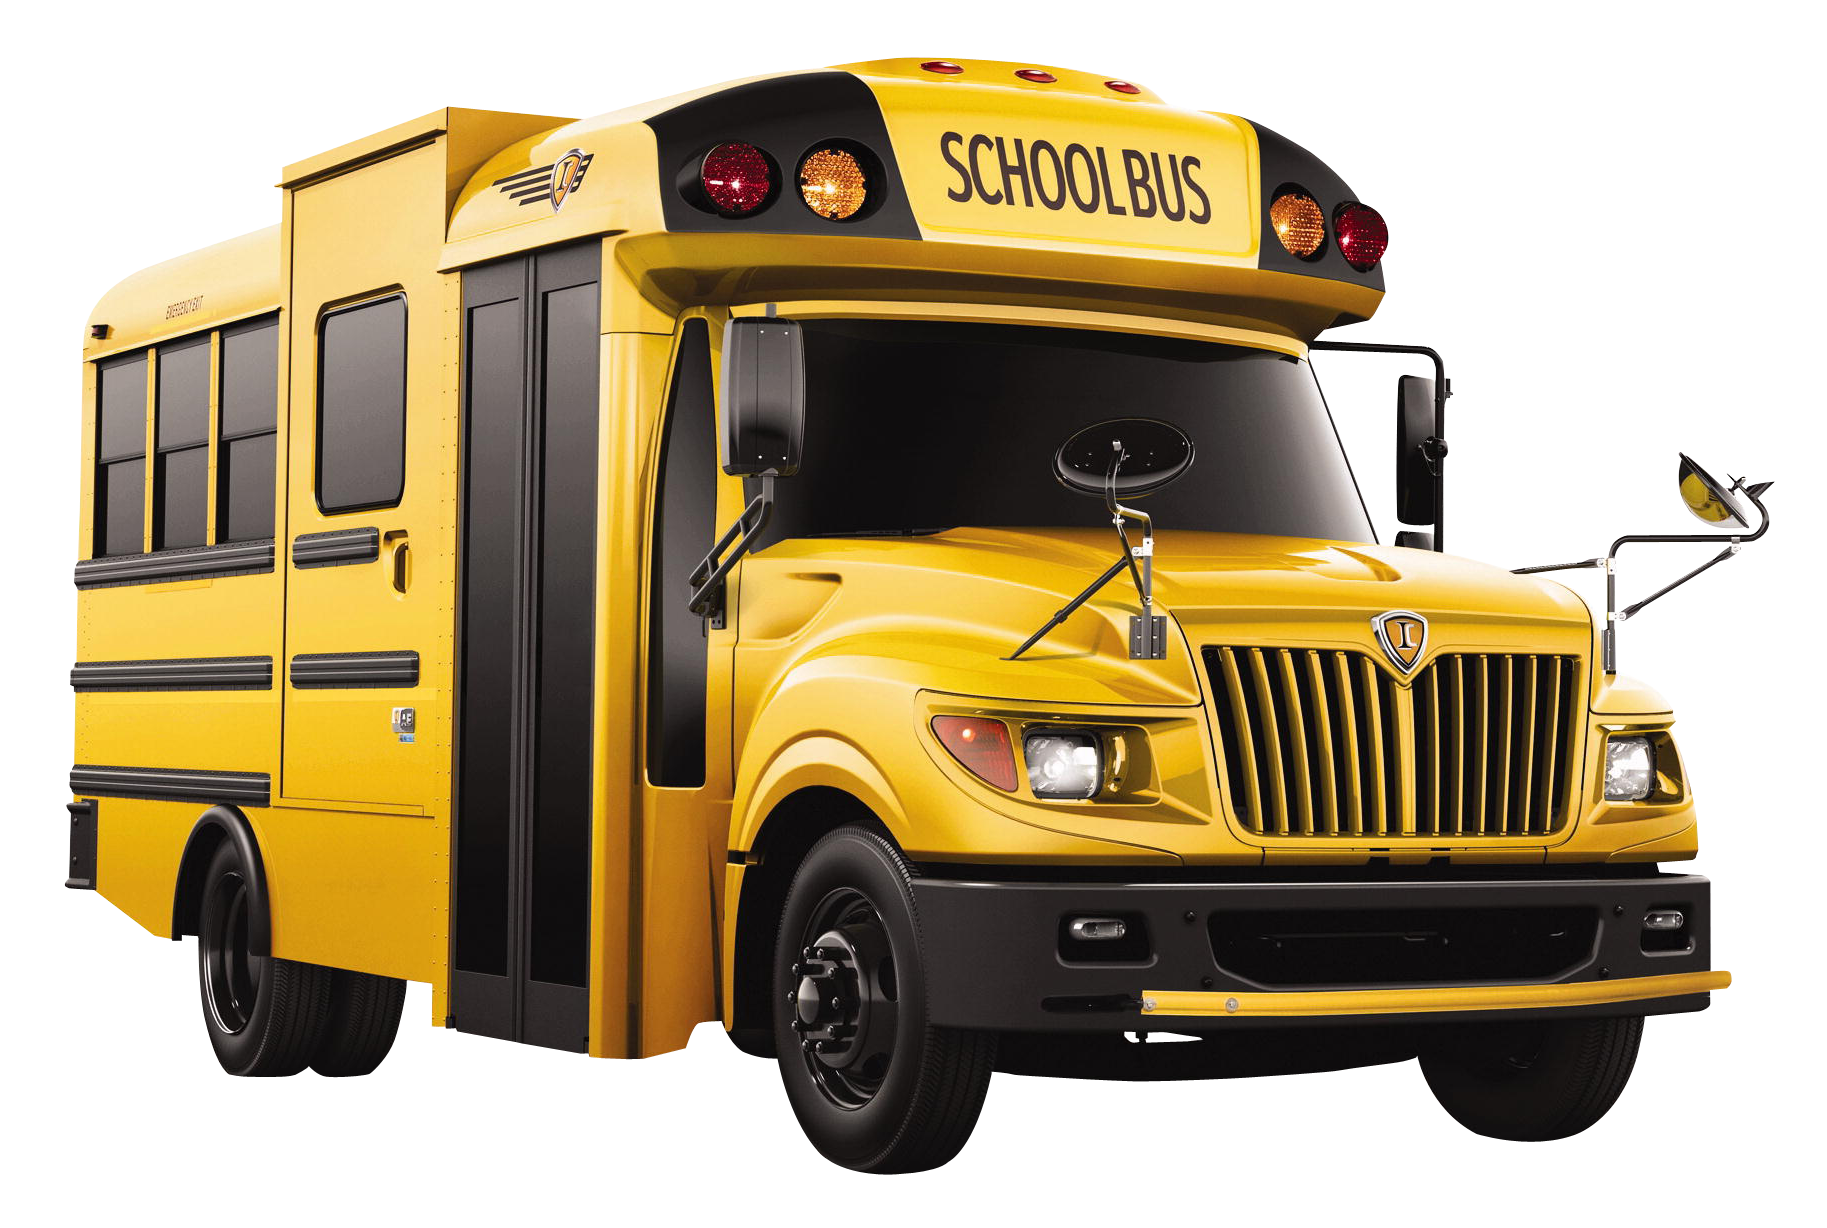 School Bus PNG Image.